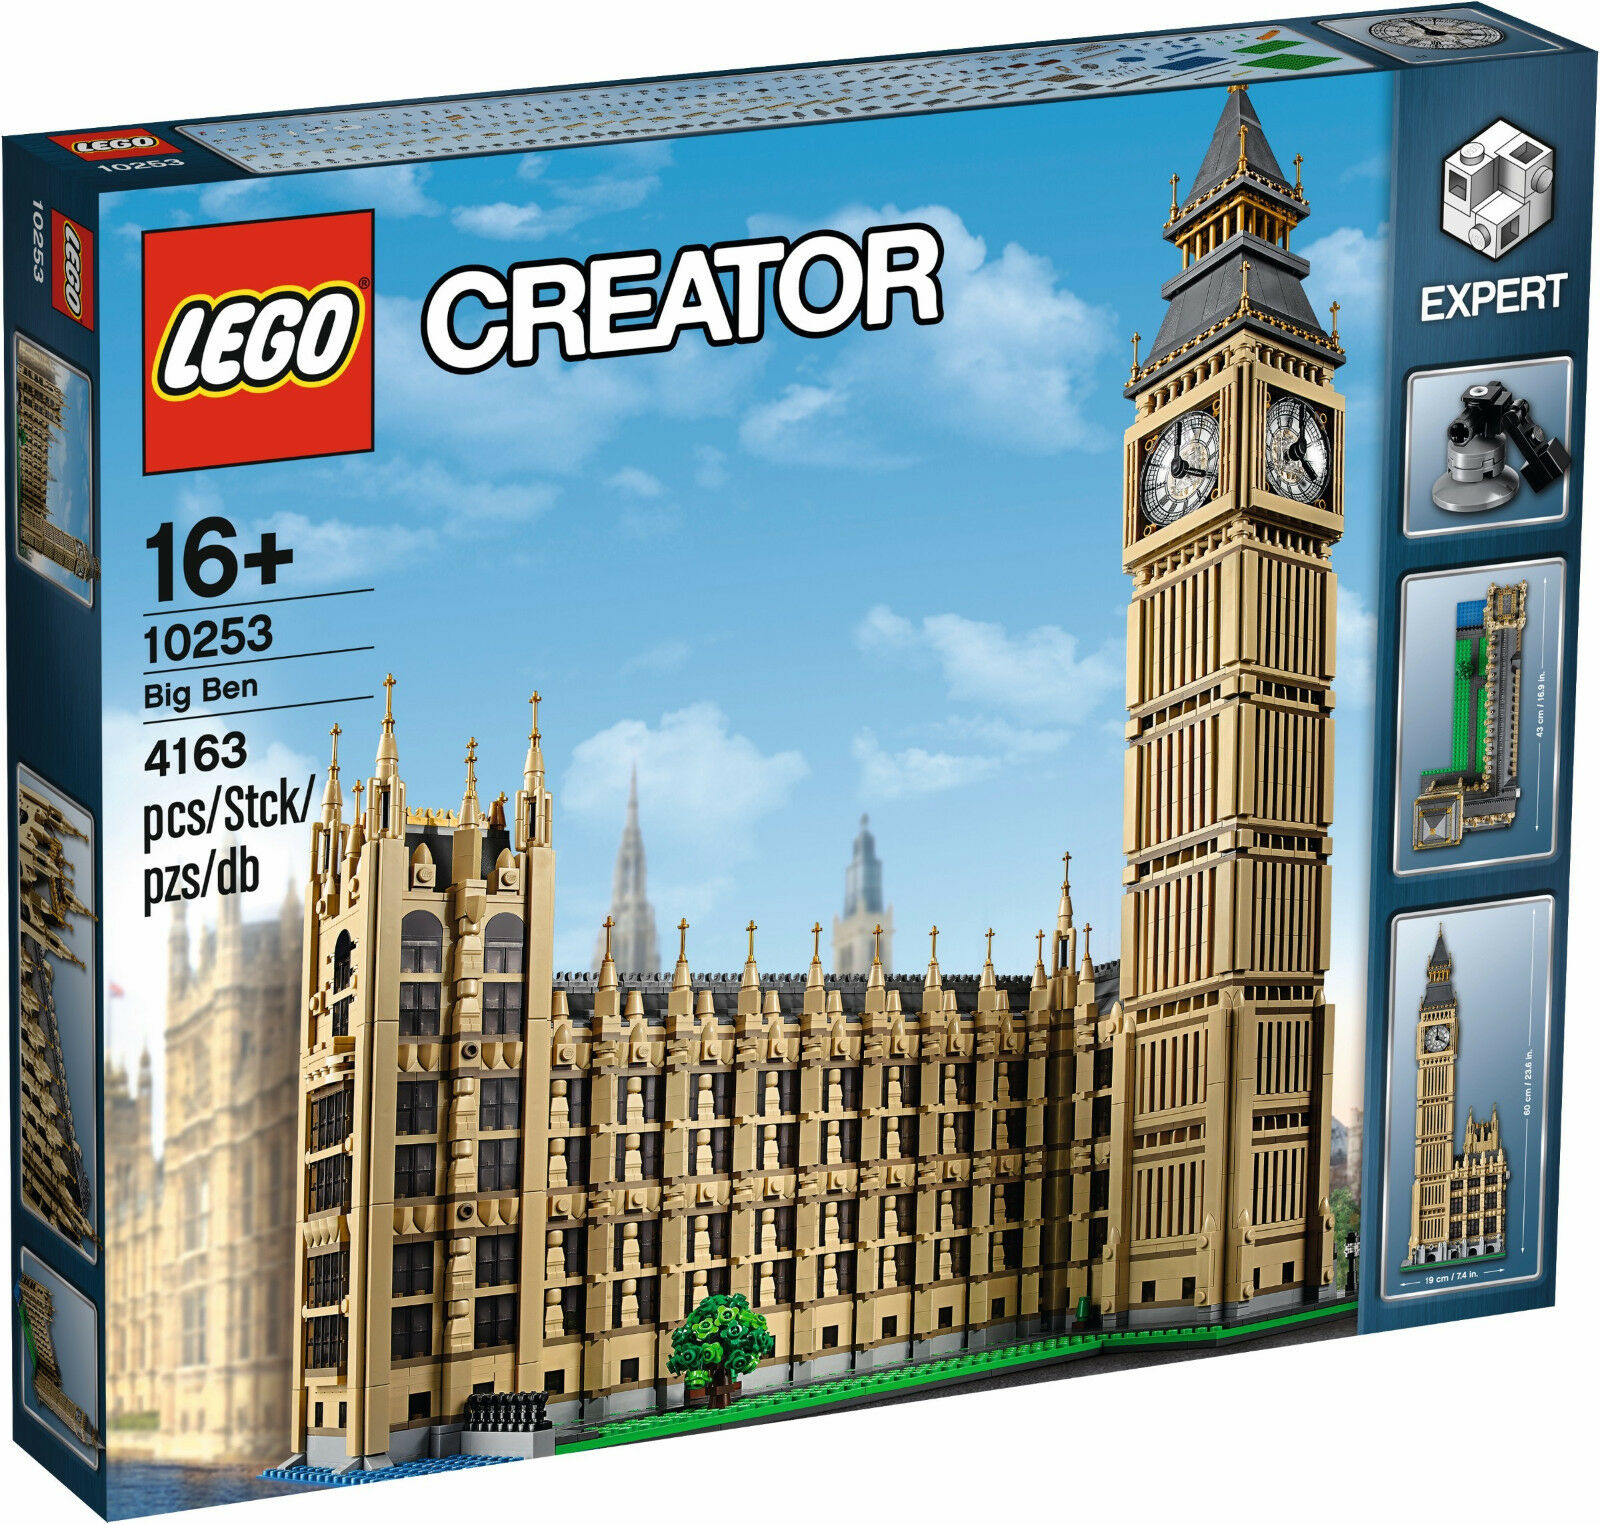 LEGO exclusif Exclusive - 10253 Big Ben-NOUVEAU & NEUF dans sa boîte